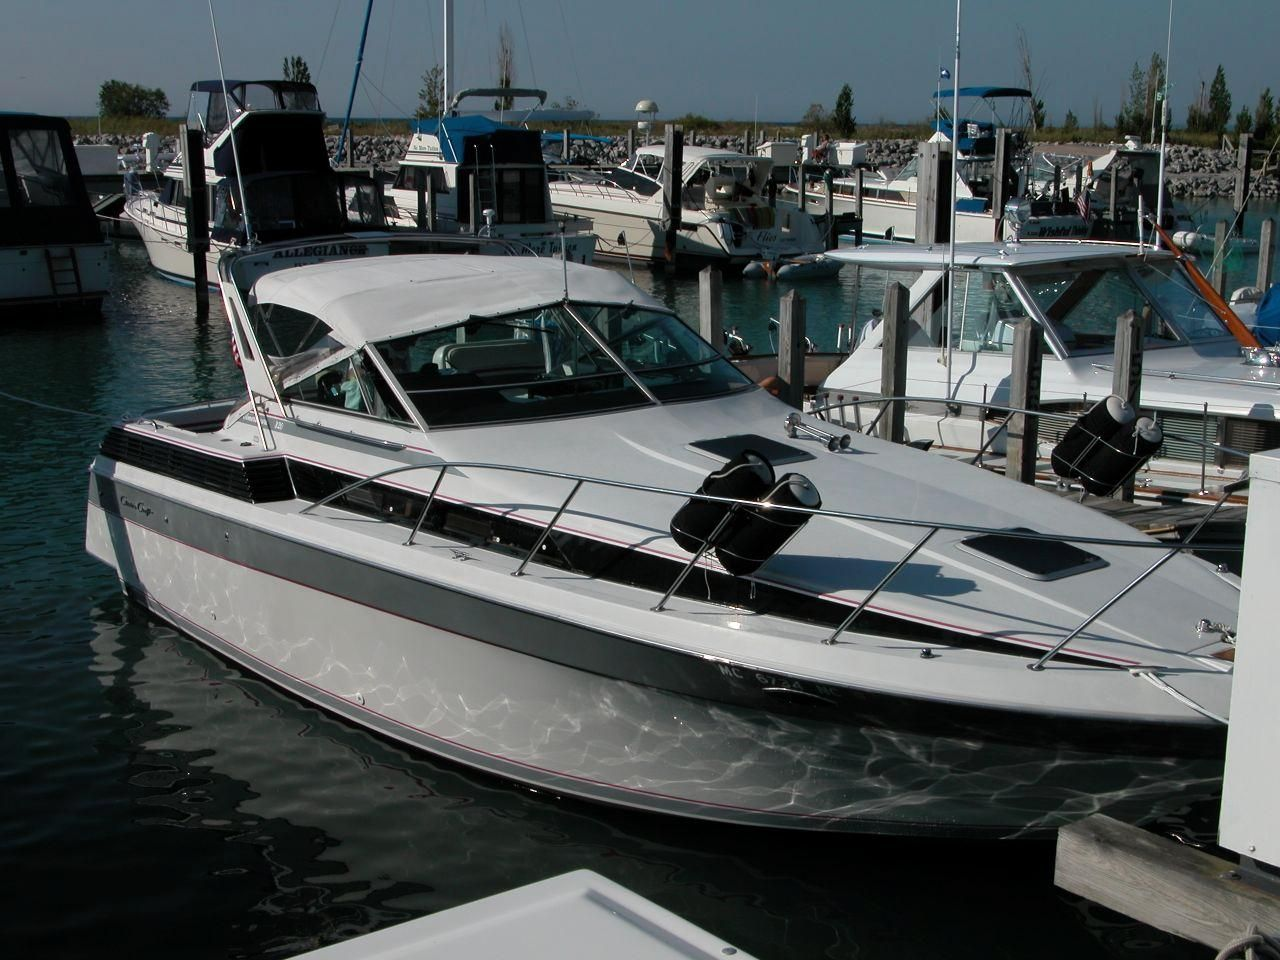 1987 Chris Craft Amerosport 320 Power Boat For Sale Www